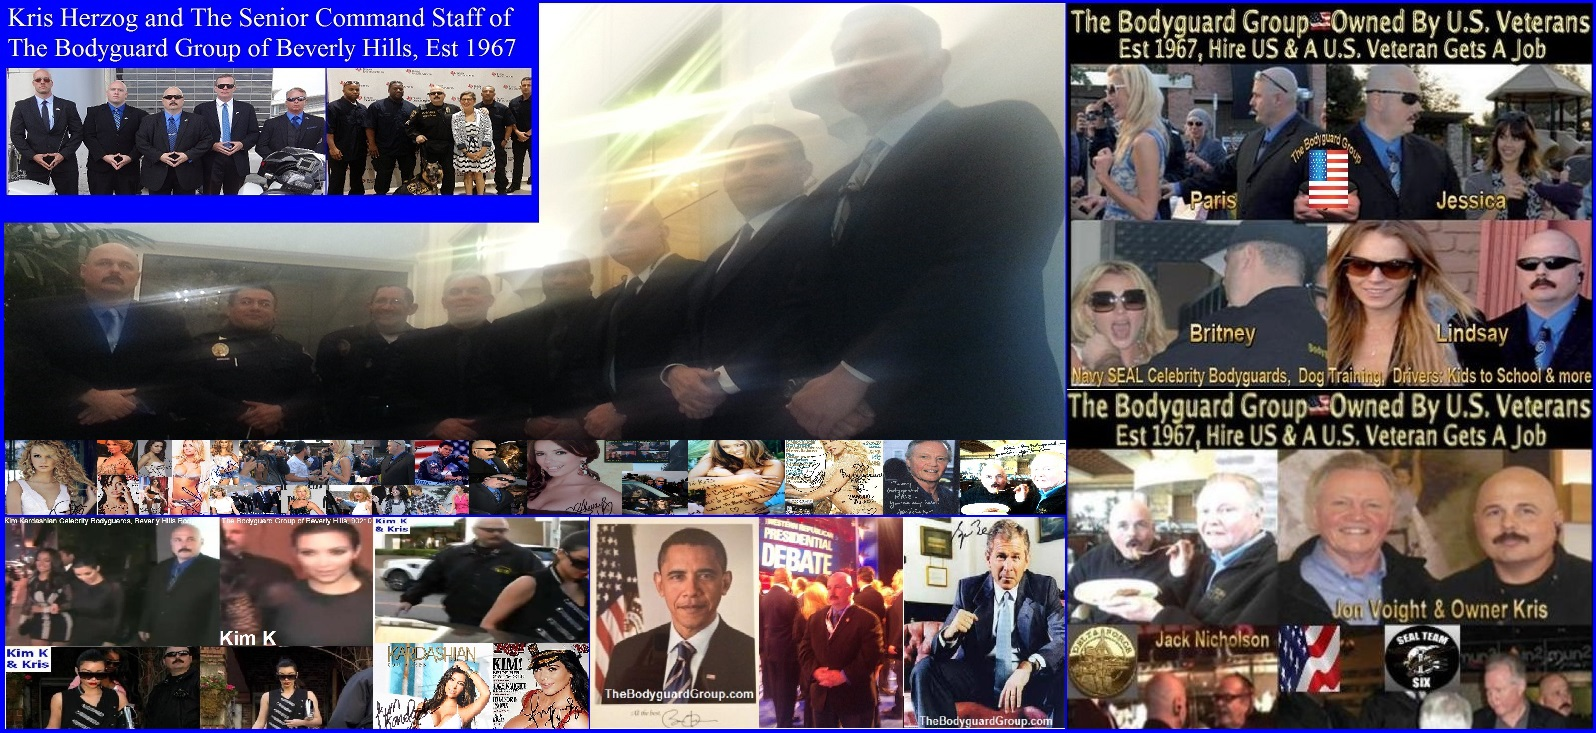 Famous celebrity bodyguard Kris Herzog, The Bodyguard Group of Beverly Hills, 90210, Los Angeles armed celebrity bodyguard for hire